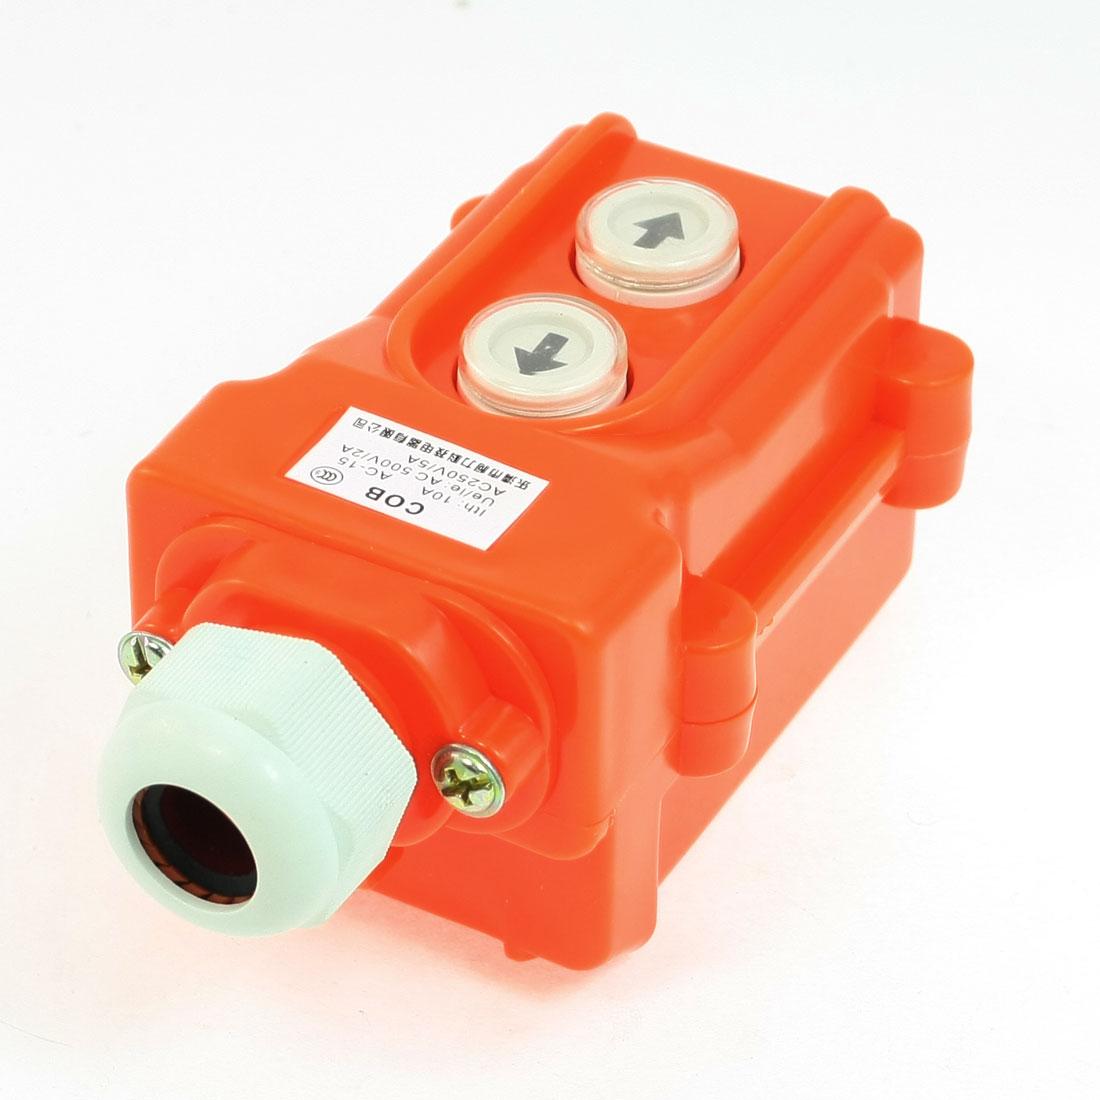 Hoist Crane Push Button Switch Up Down 2 Ways AC 250V 5A 500V 2A